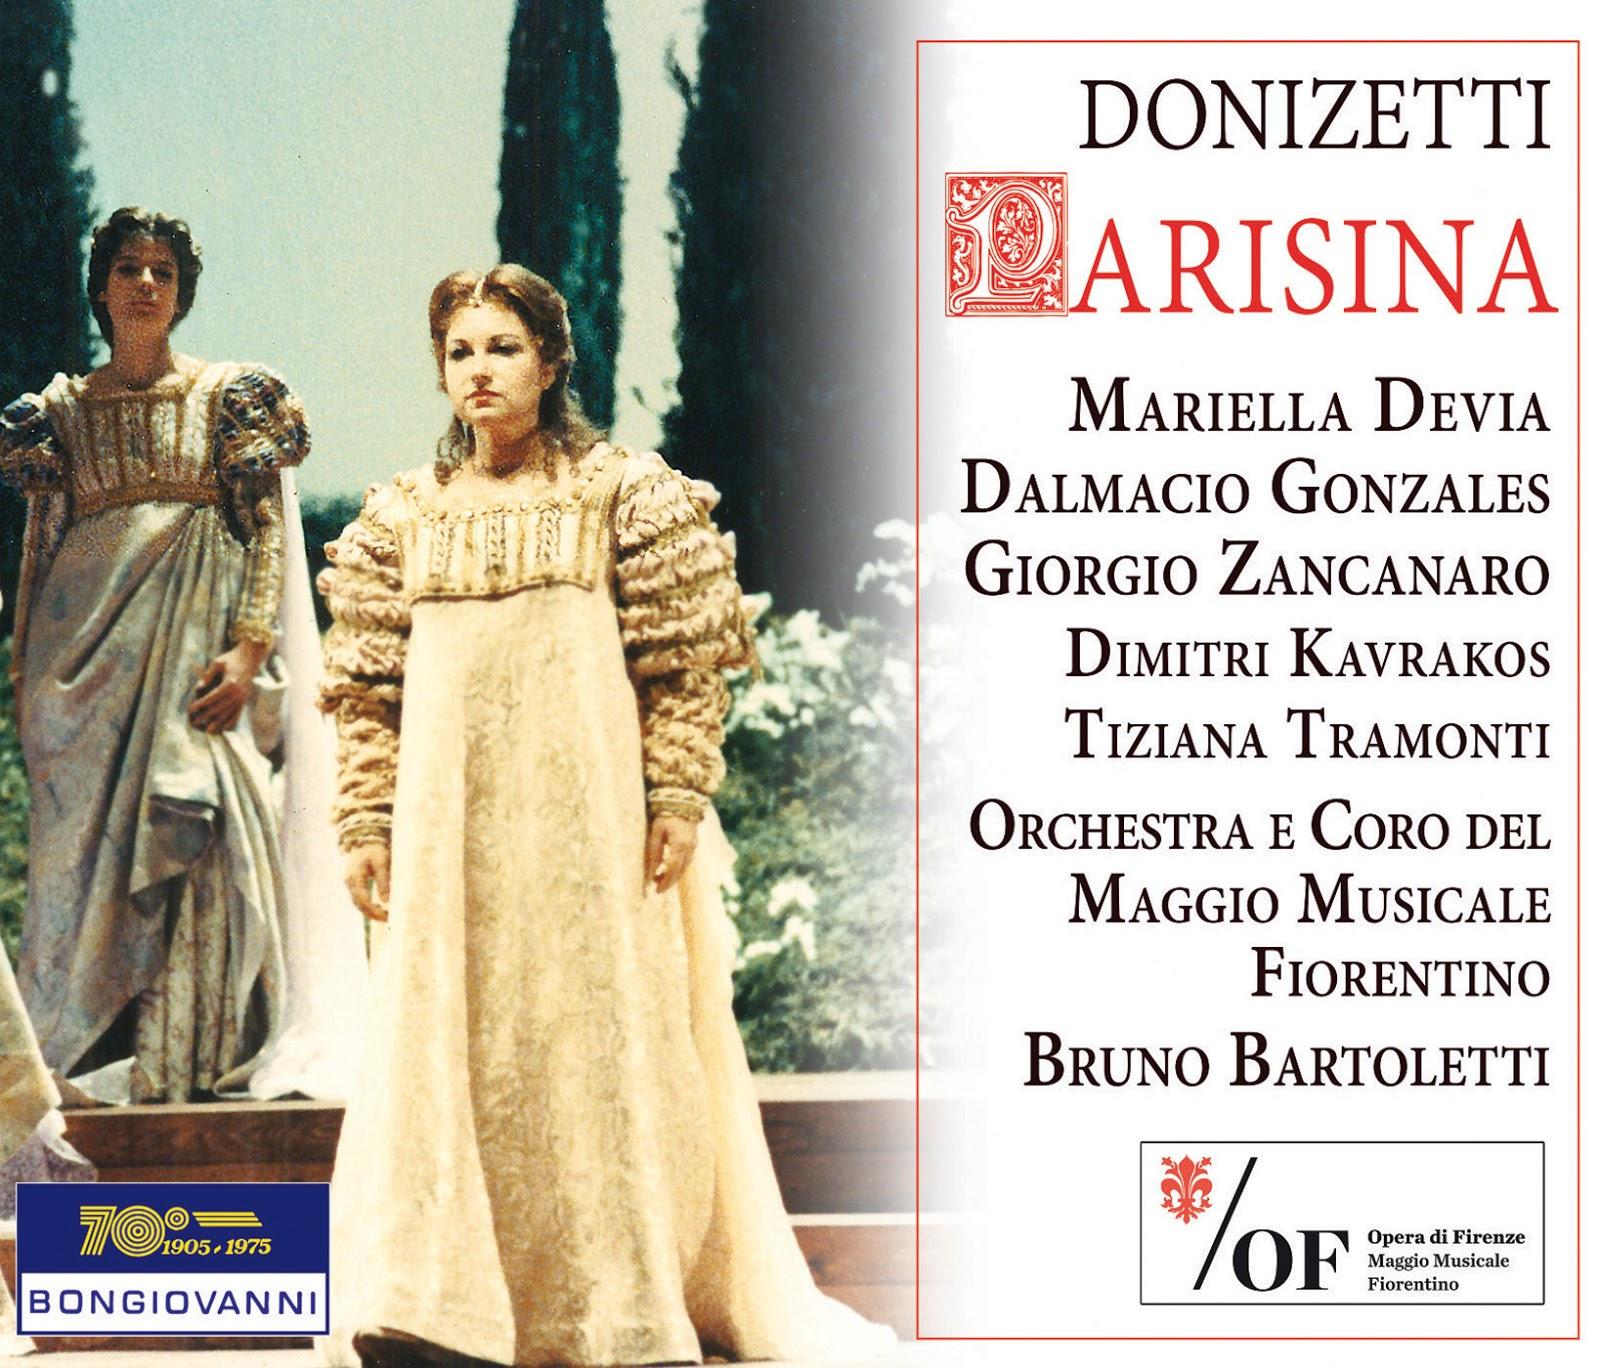 CD REVIEW: Gaetano Donizetti - PARISINA D'ESTE (Bongiovanni GB 2569/70-2)